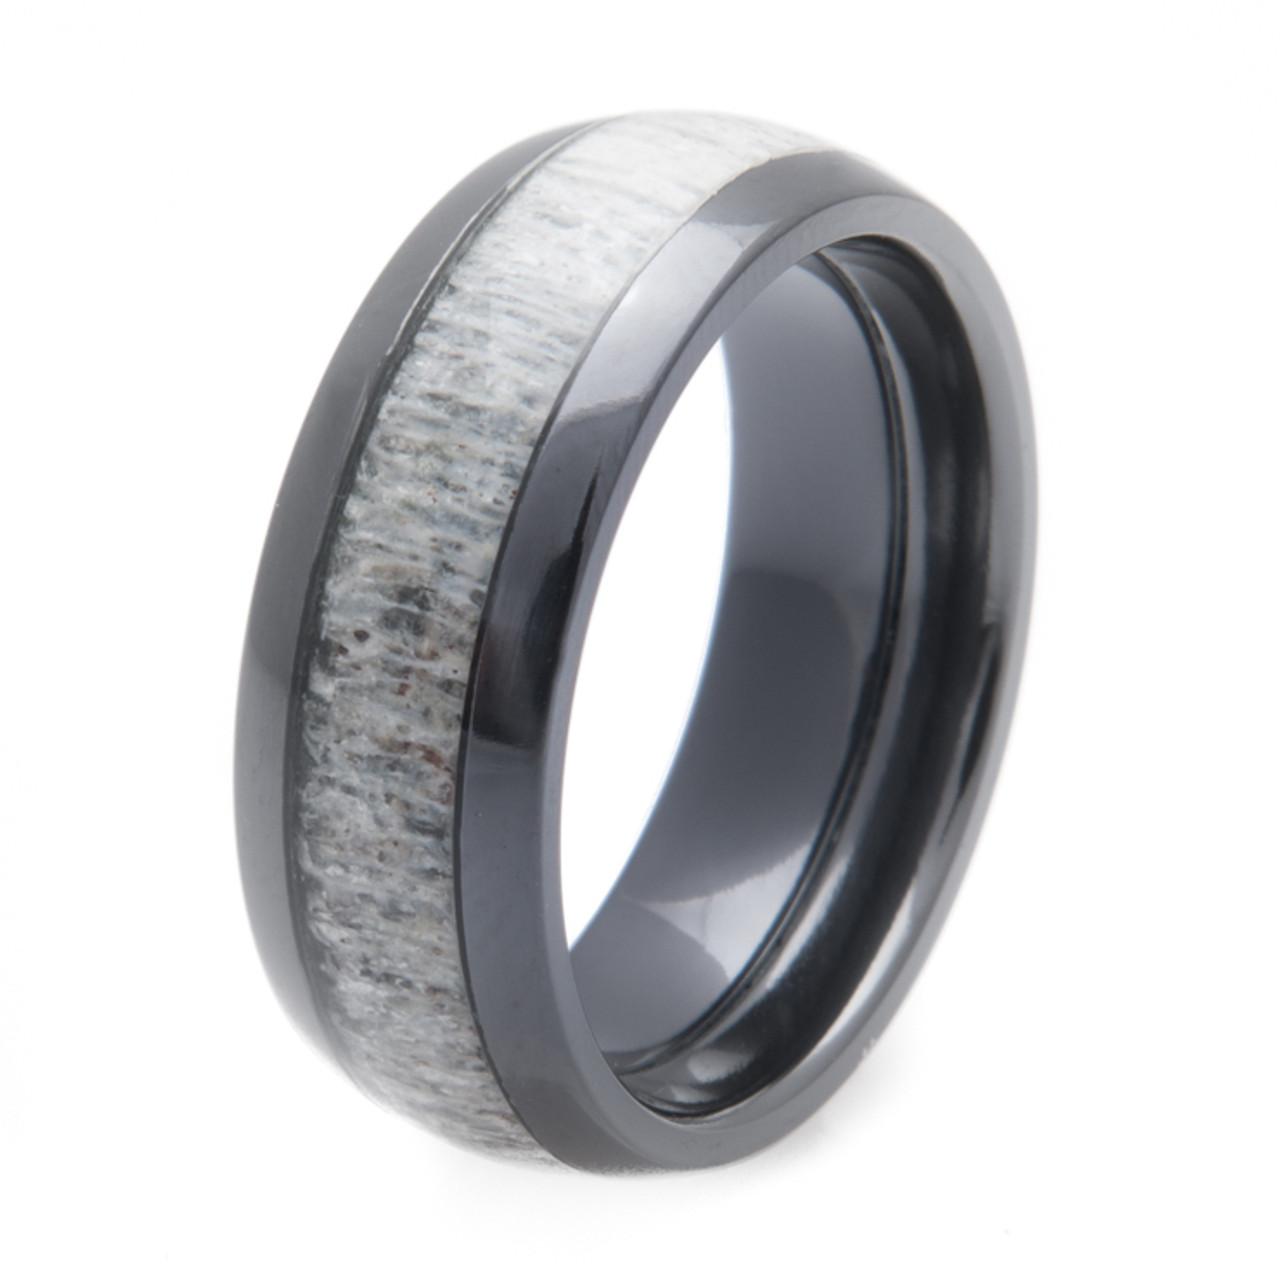 mens black zirconium deer antler ring - Cool Wedding Rings For Guys